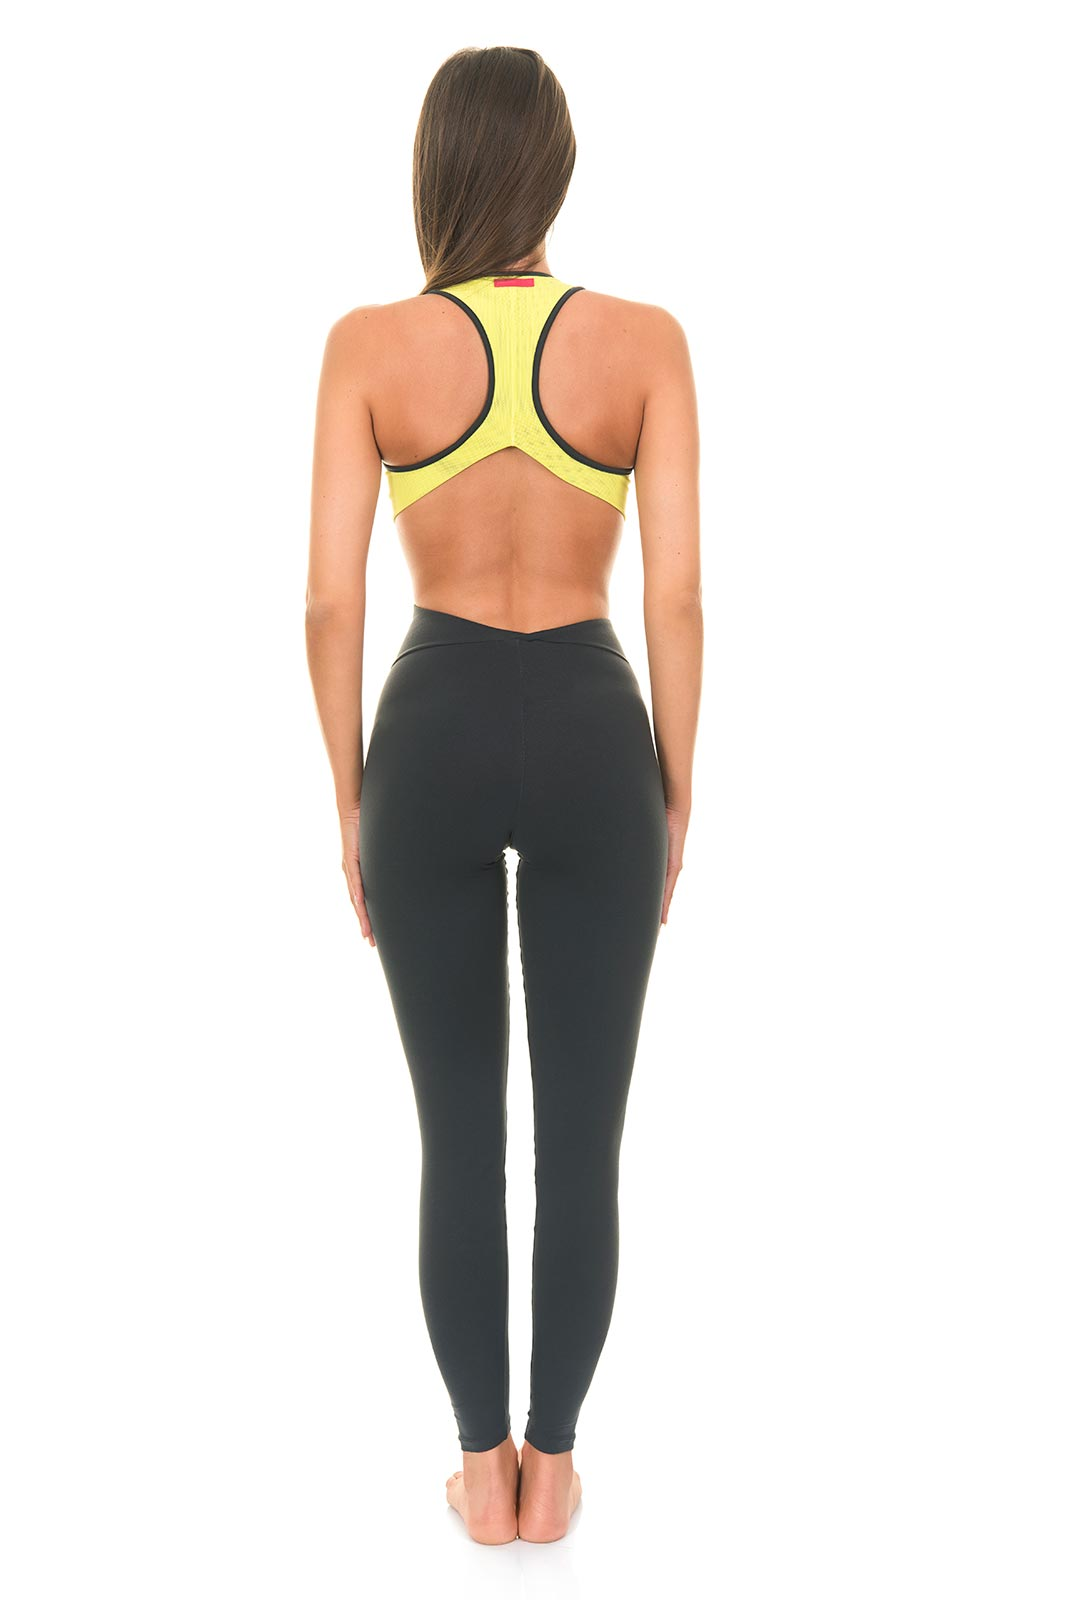 Modelo de gimnasia Bikini fitness